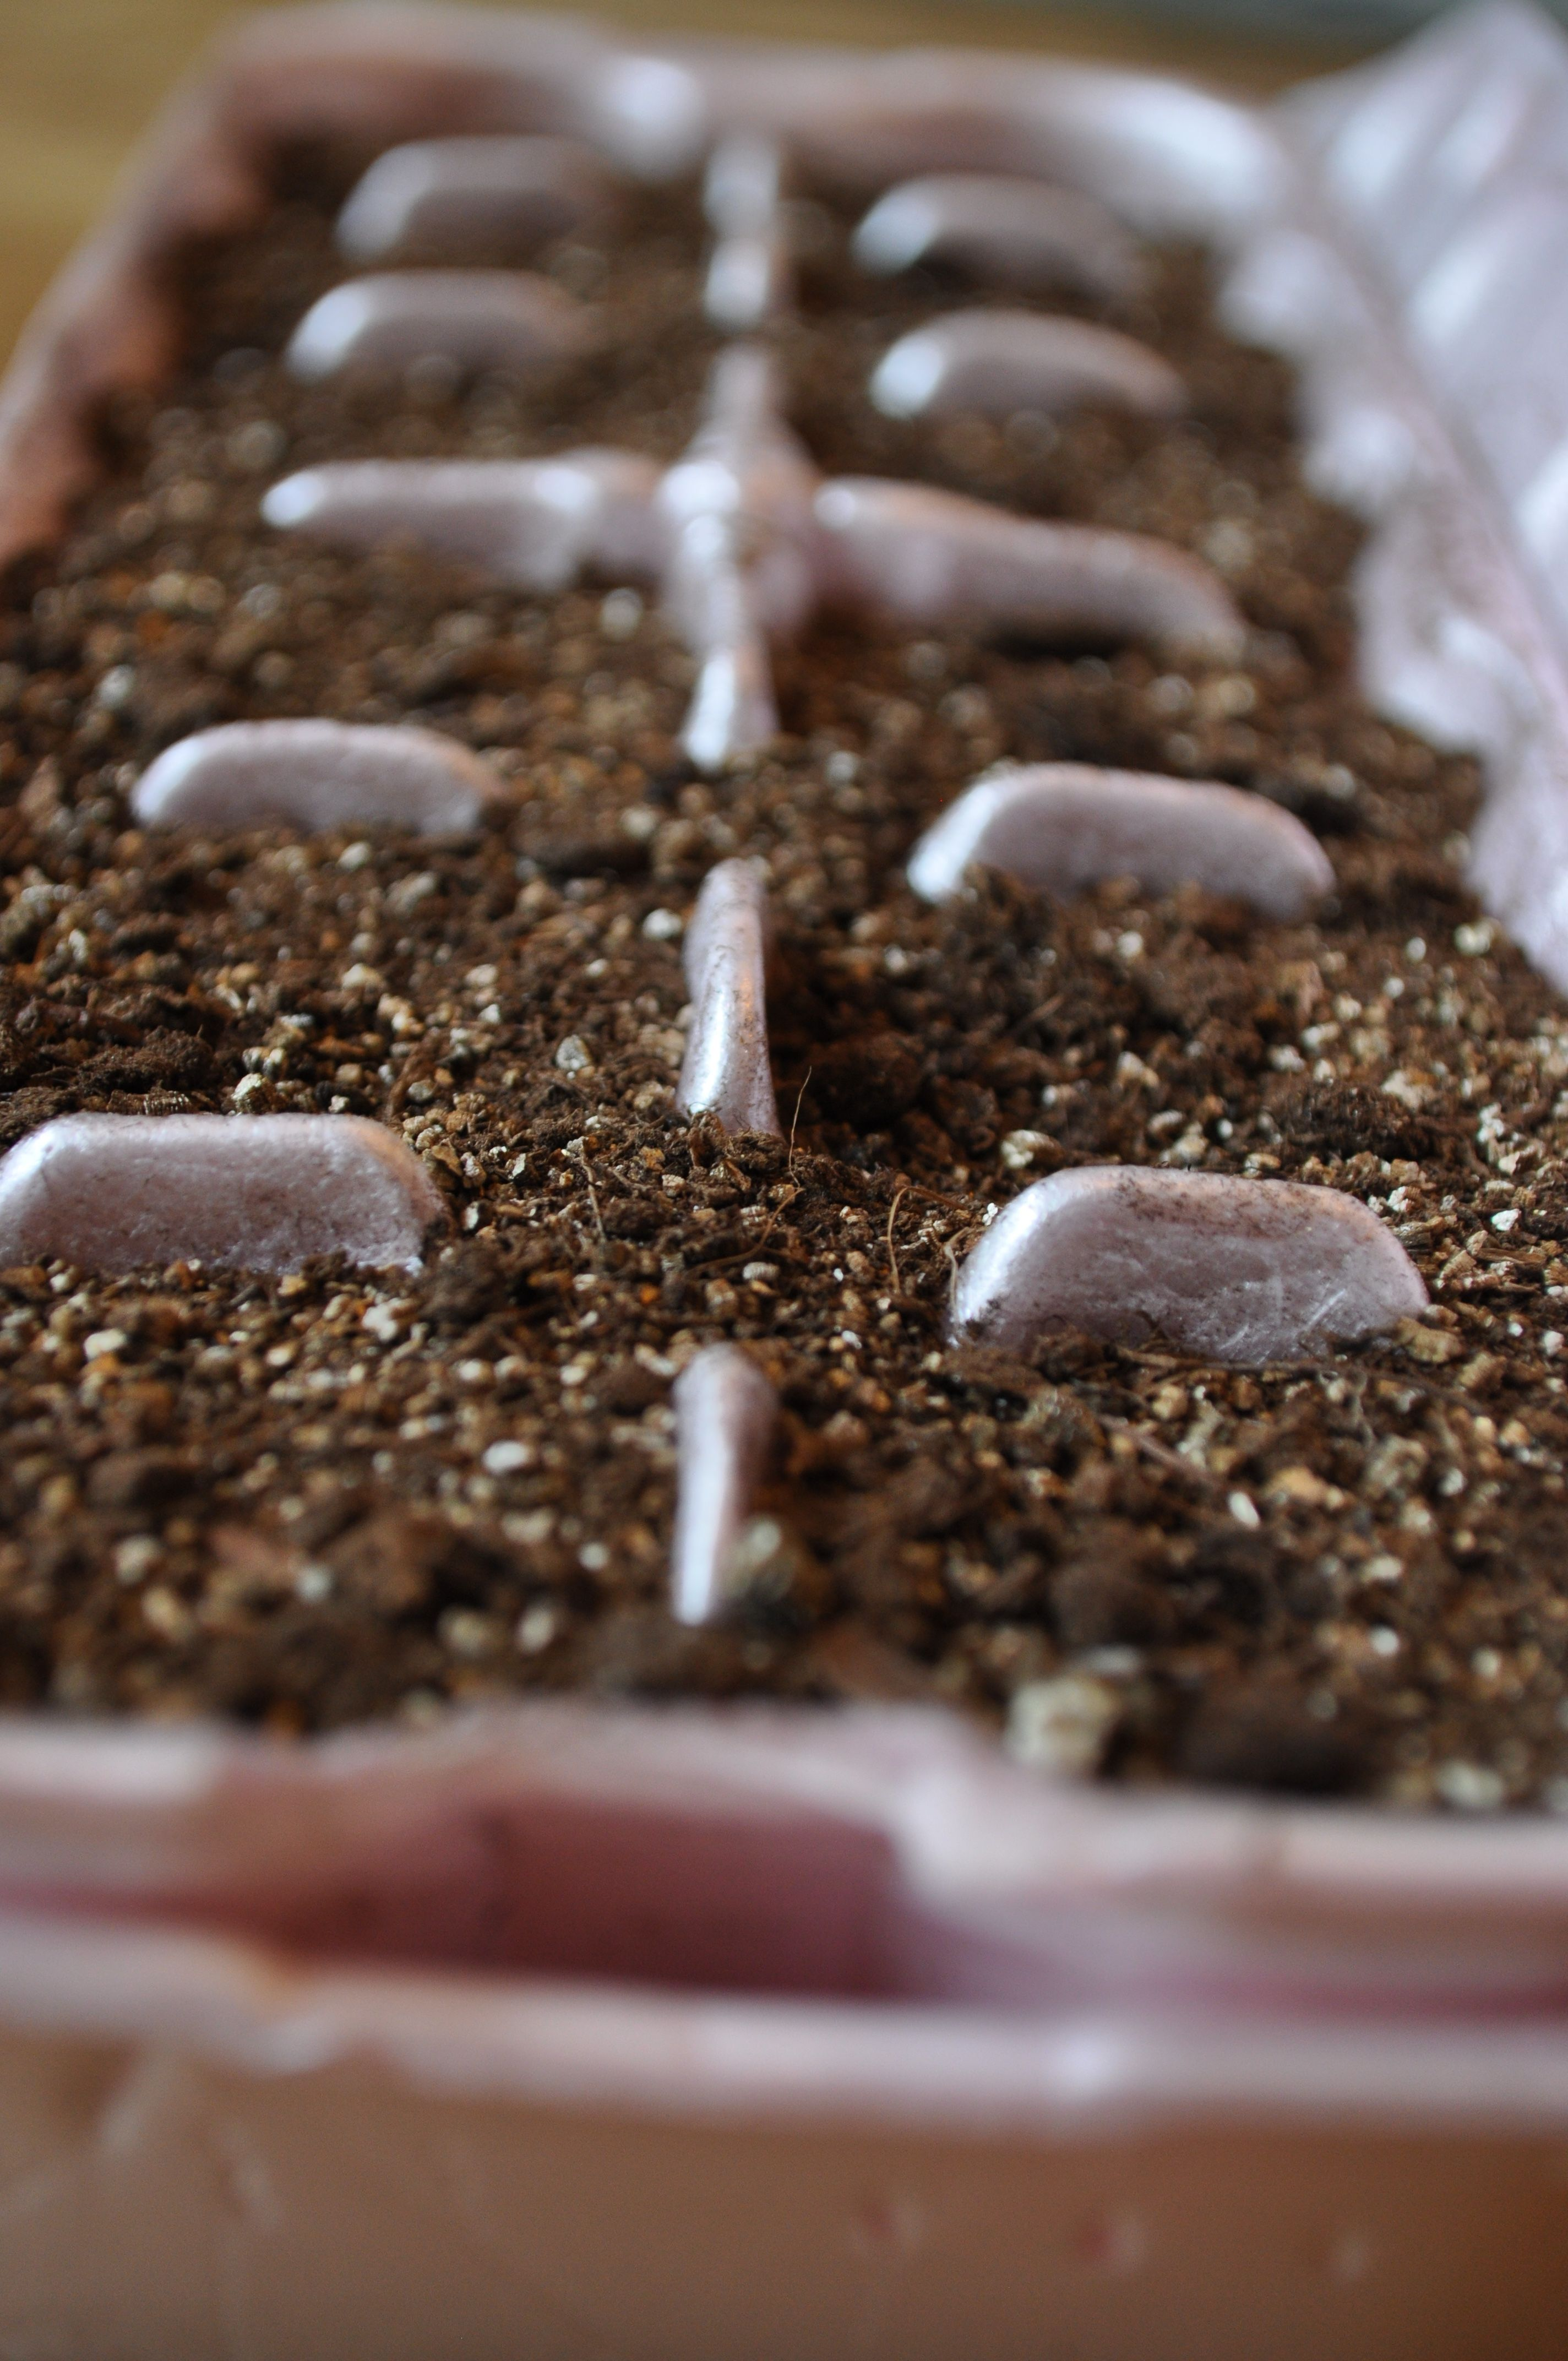 Simple Fun For Young Green Thumbs Egg Carton Gardening